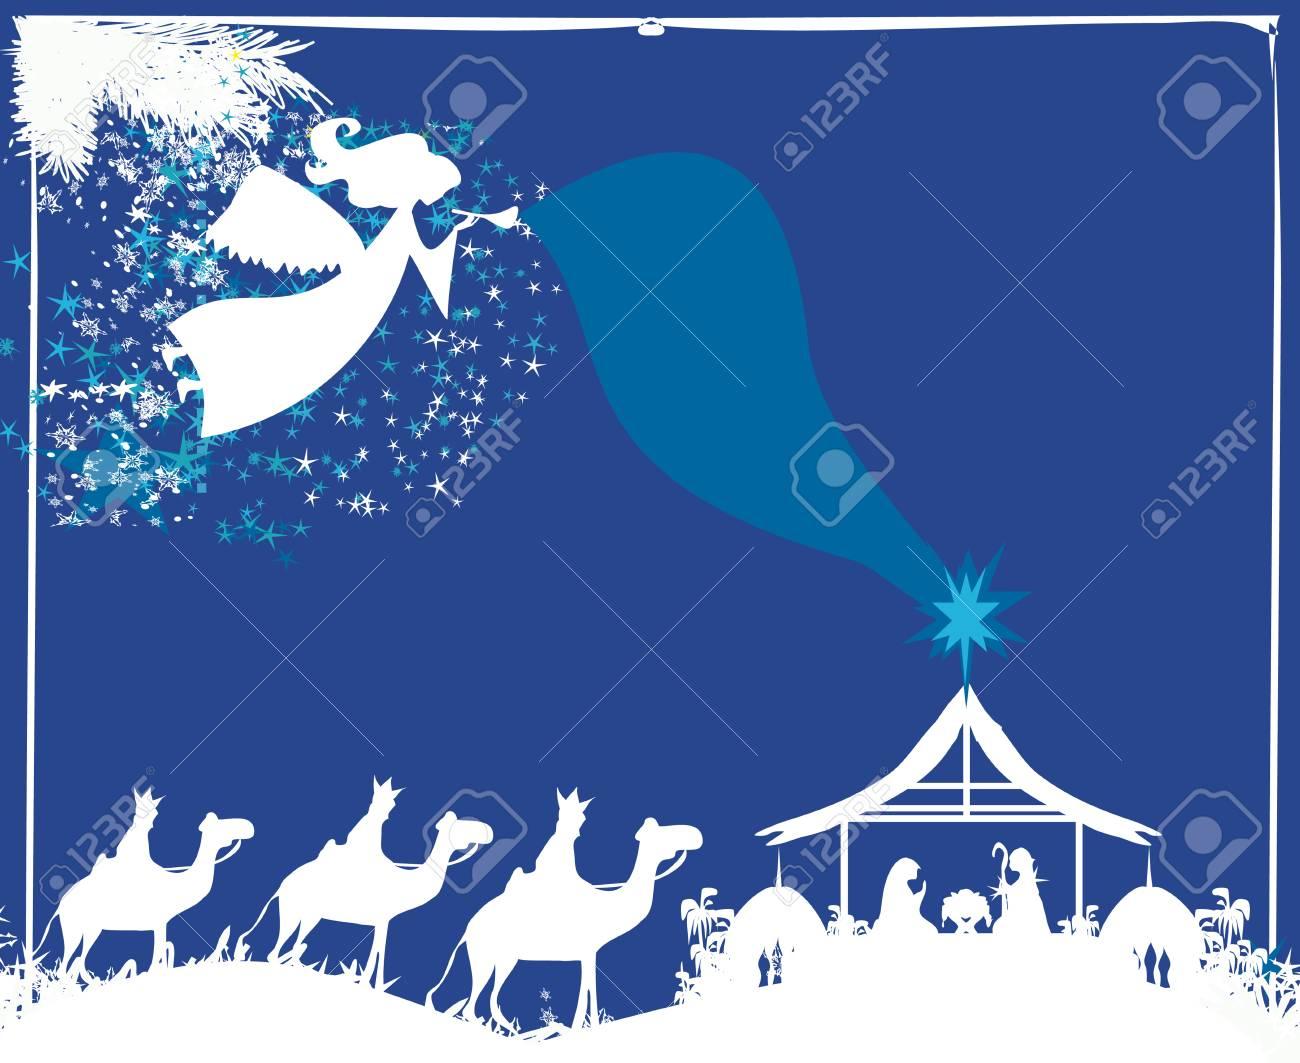 Christmas Religious.Christmas Religious Nativity Scene